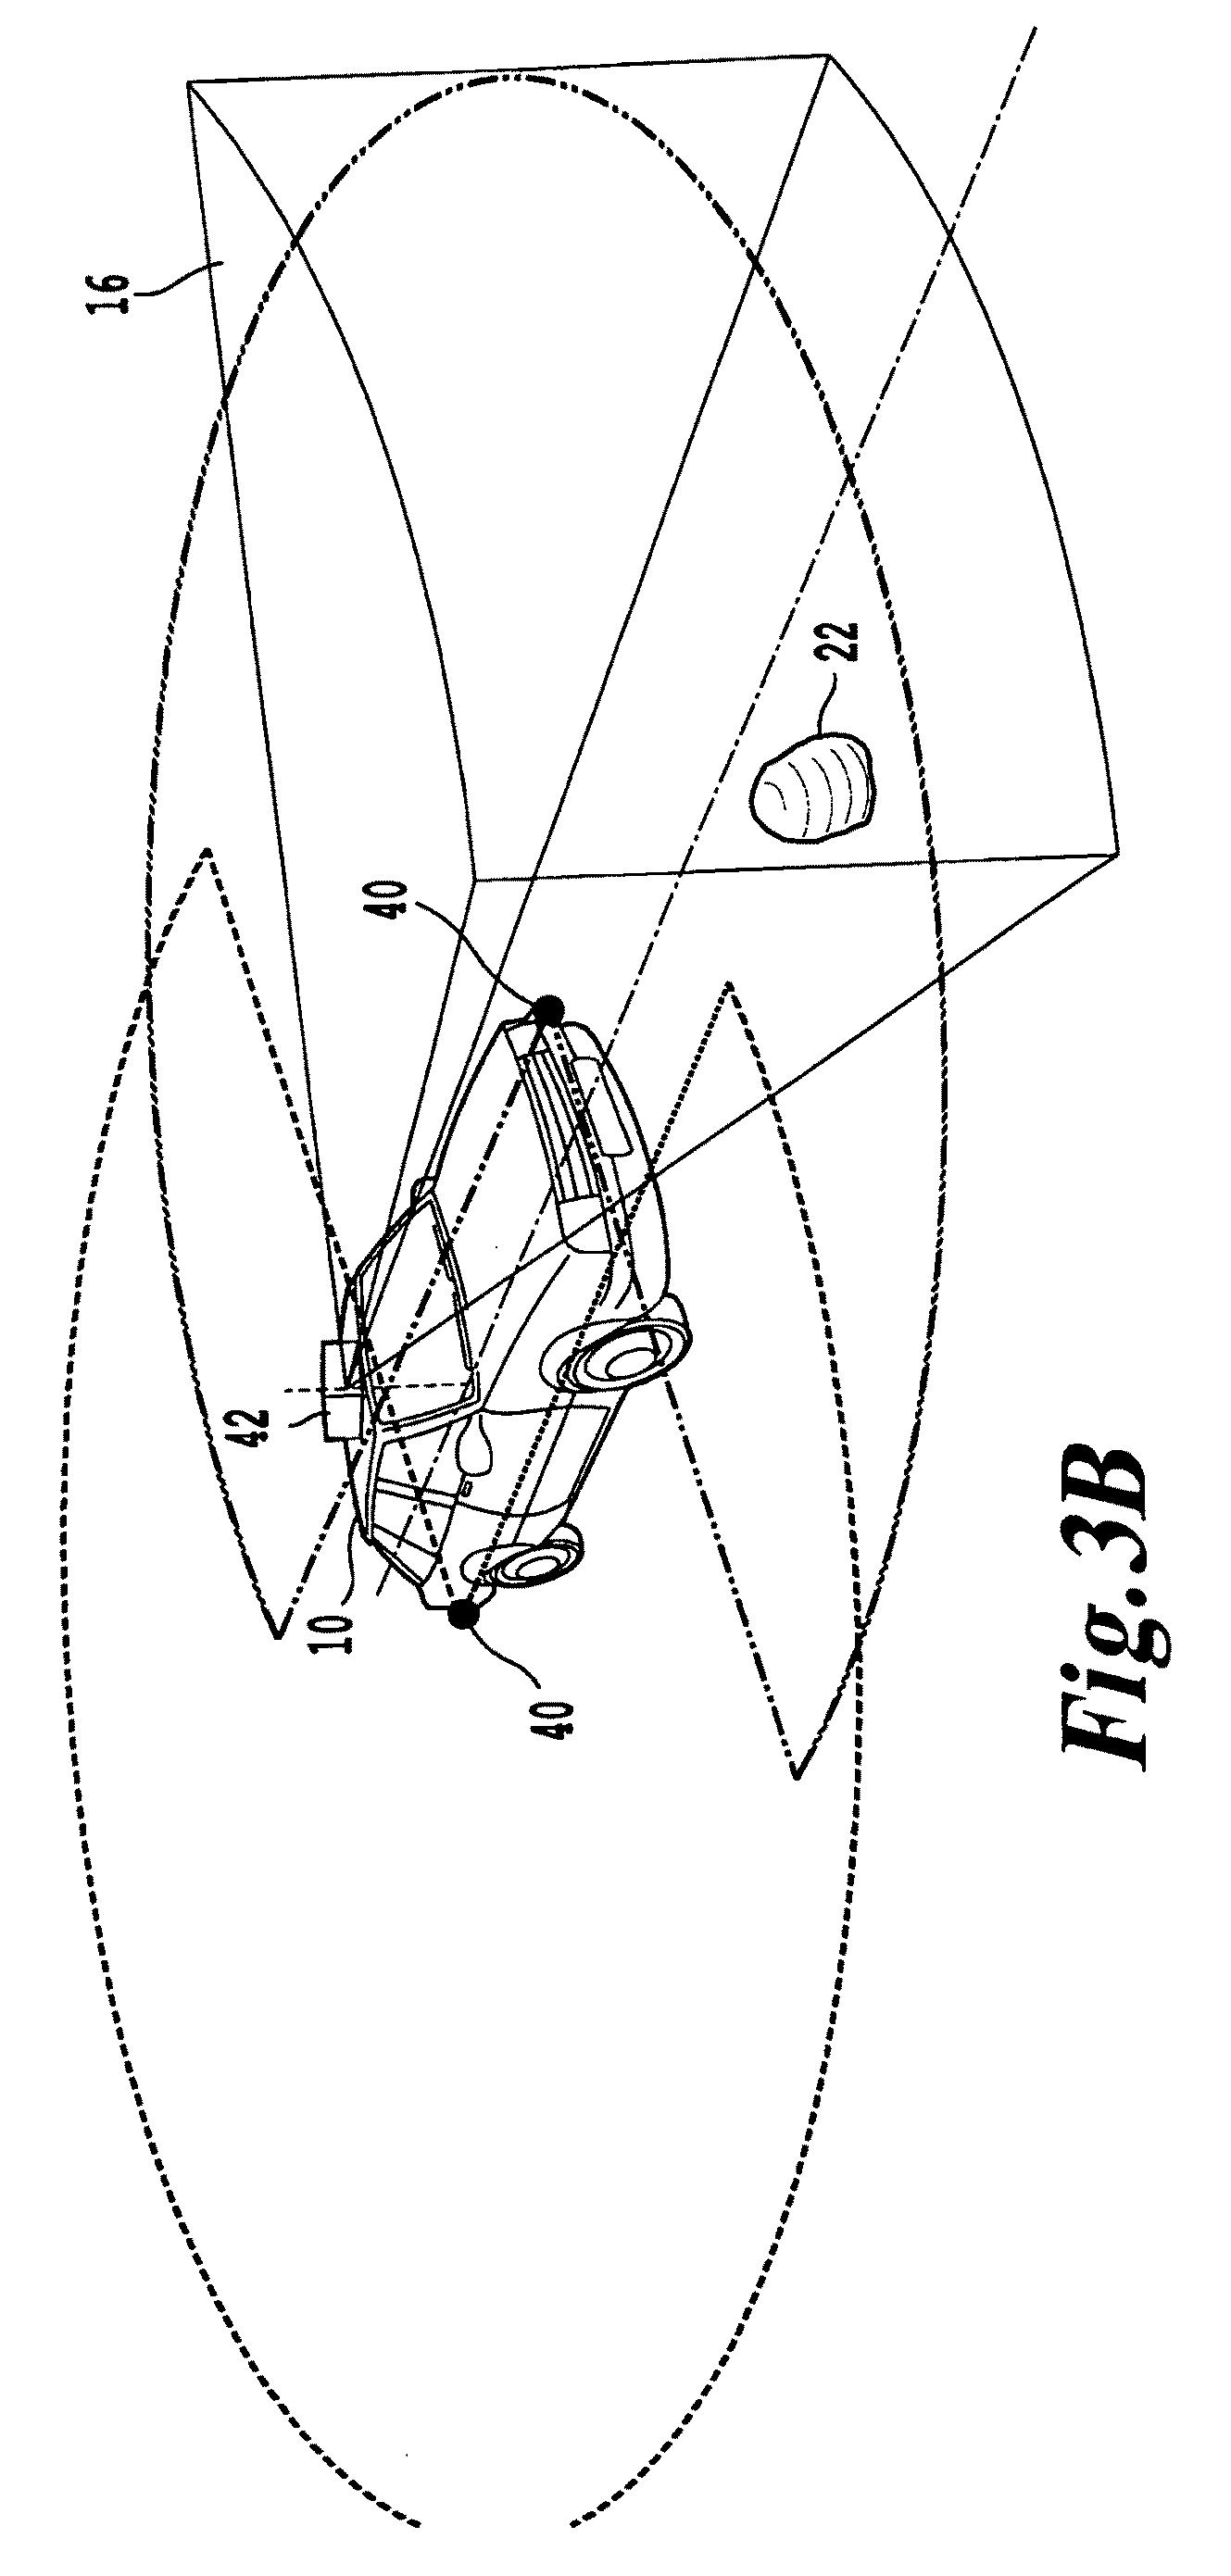 Trailer breakaway wiring diagram 6 and 7 way plugs wiring diagram